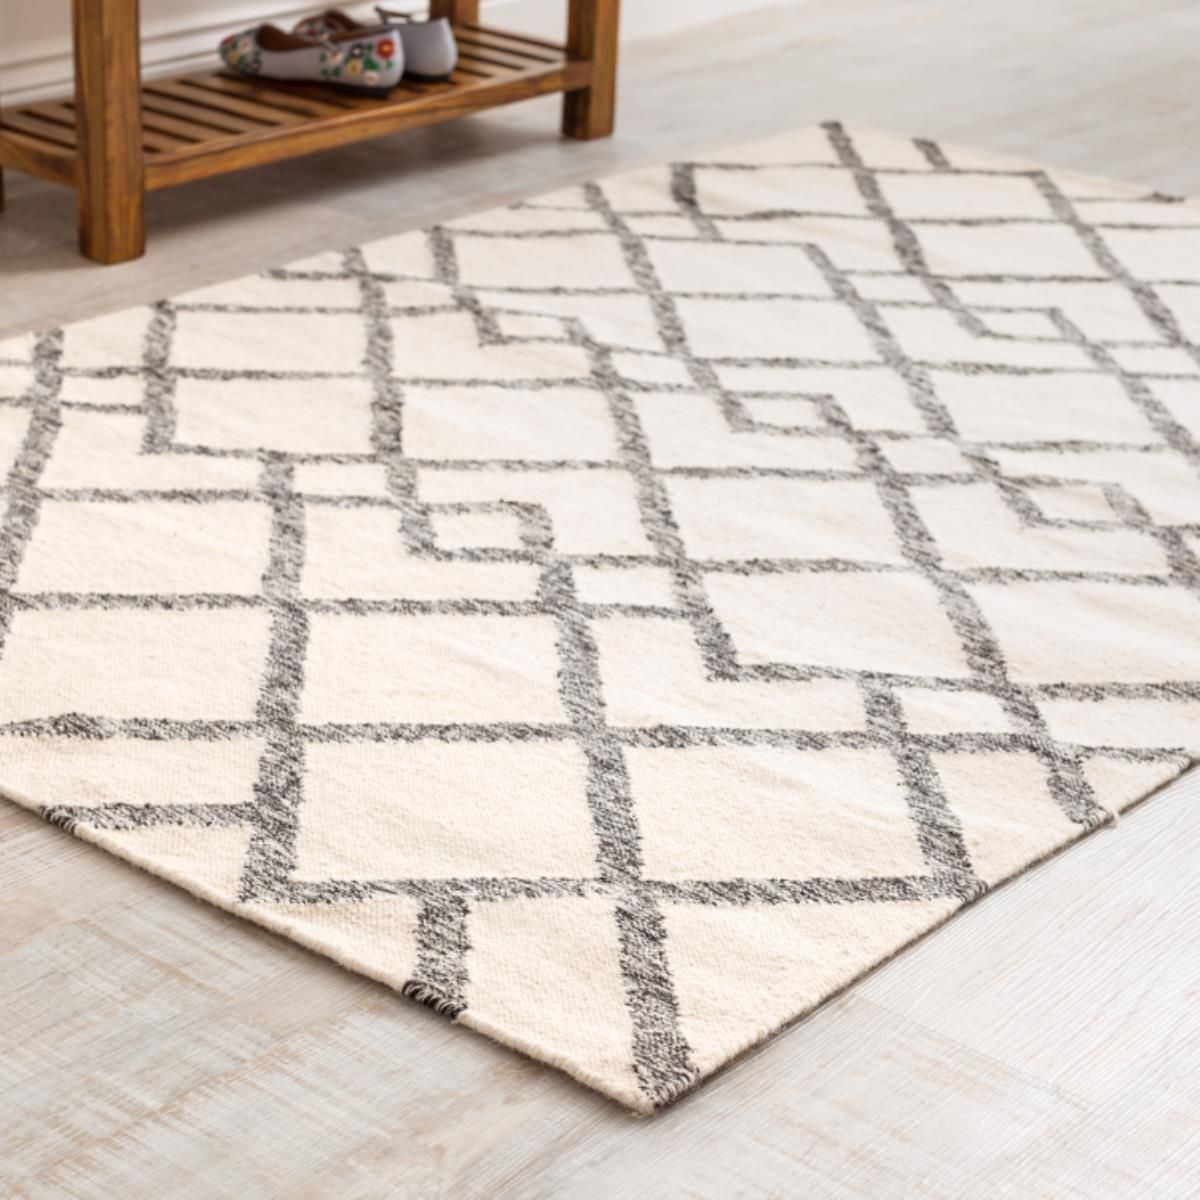 Rug And Kilim tangier kilim rug tangier woven rug and kilims